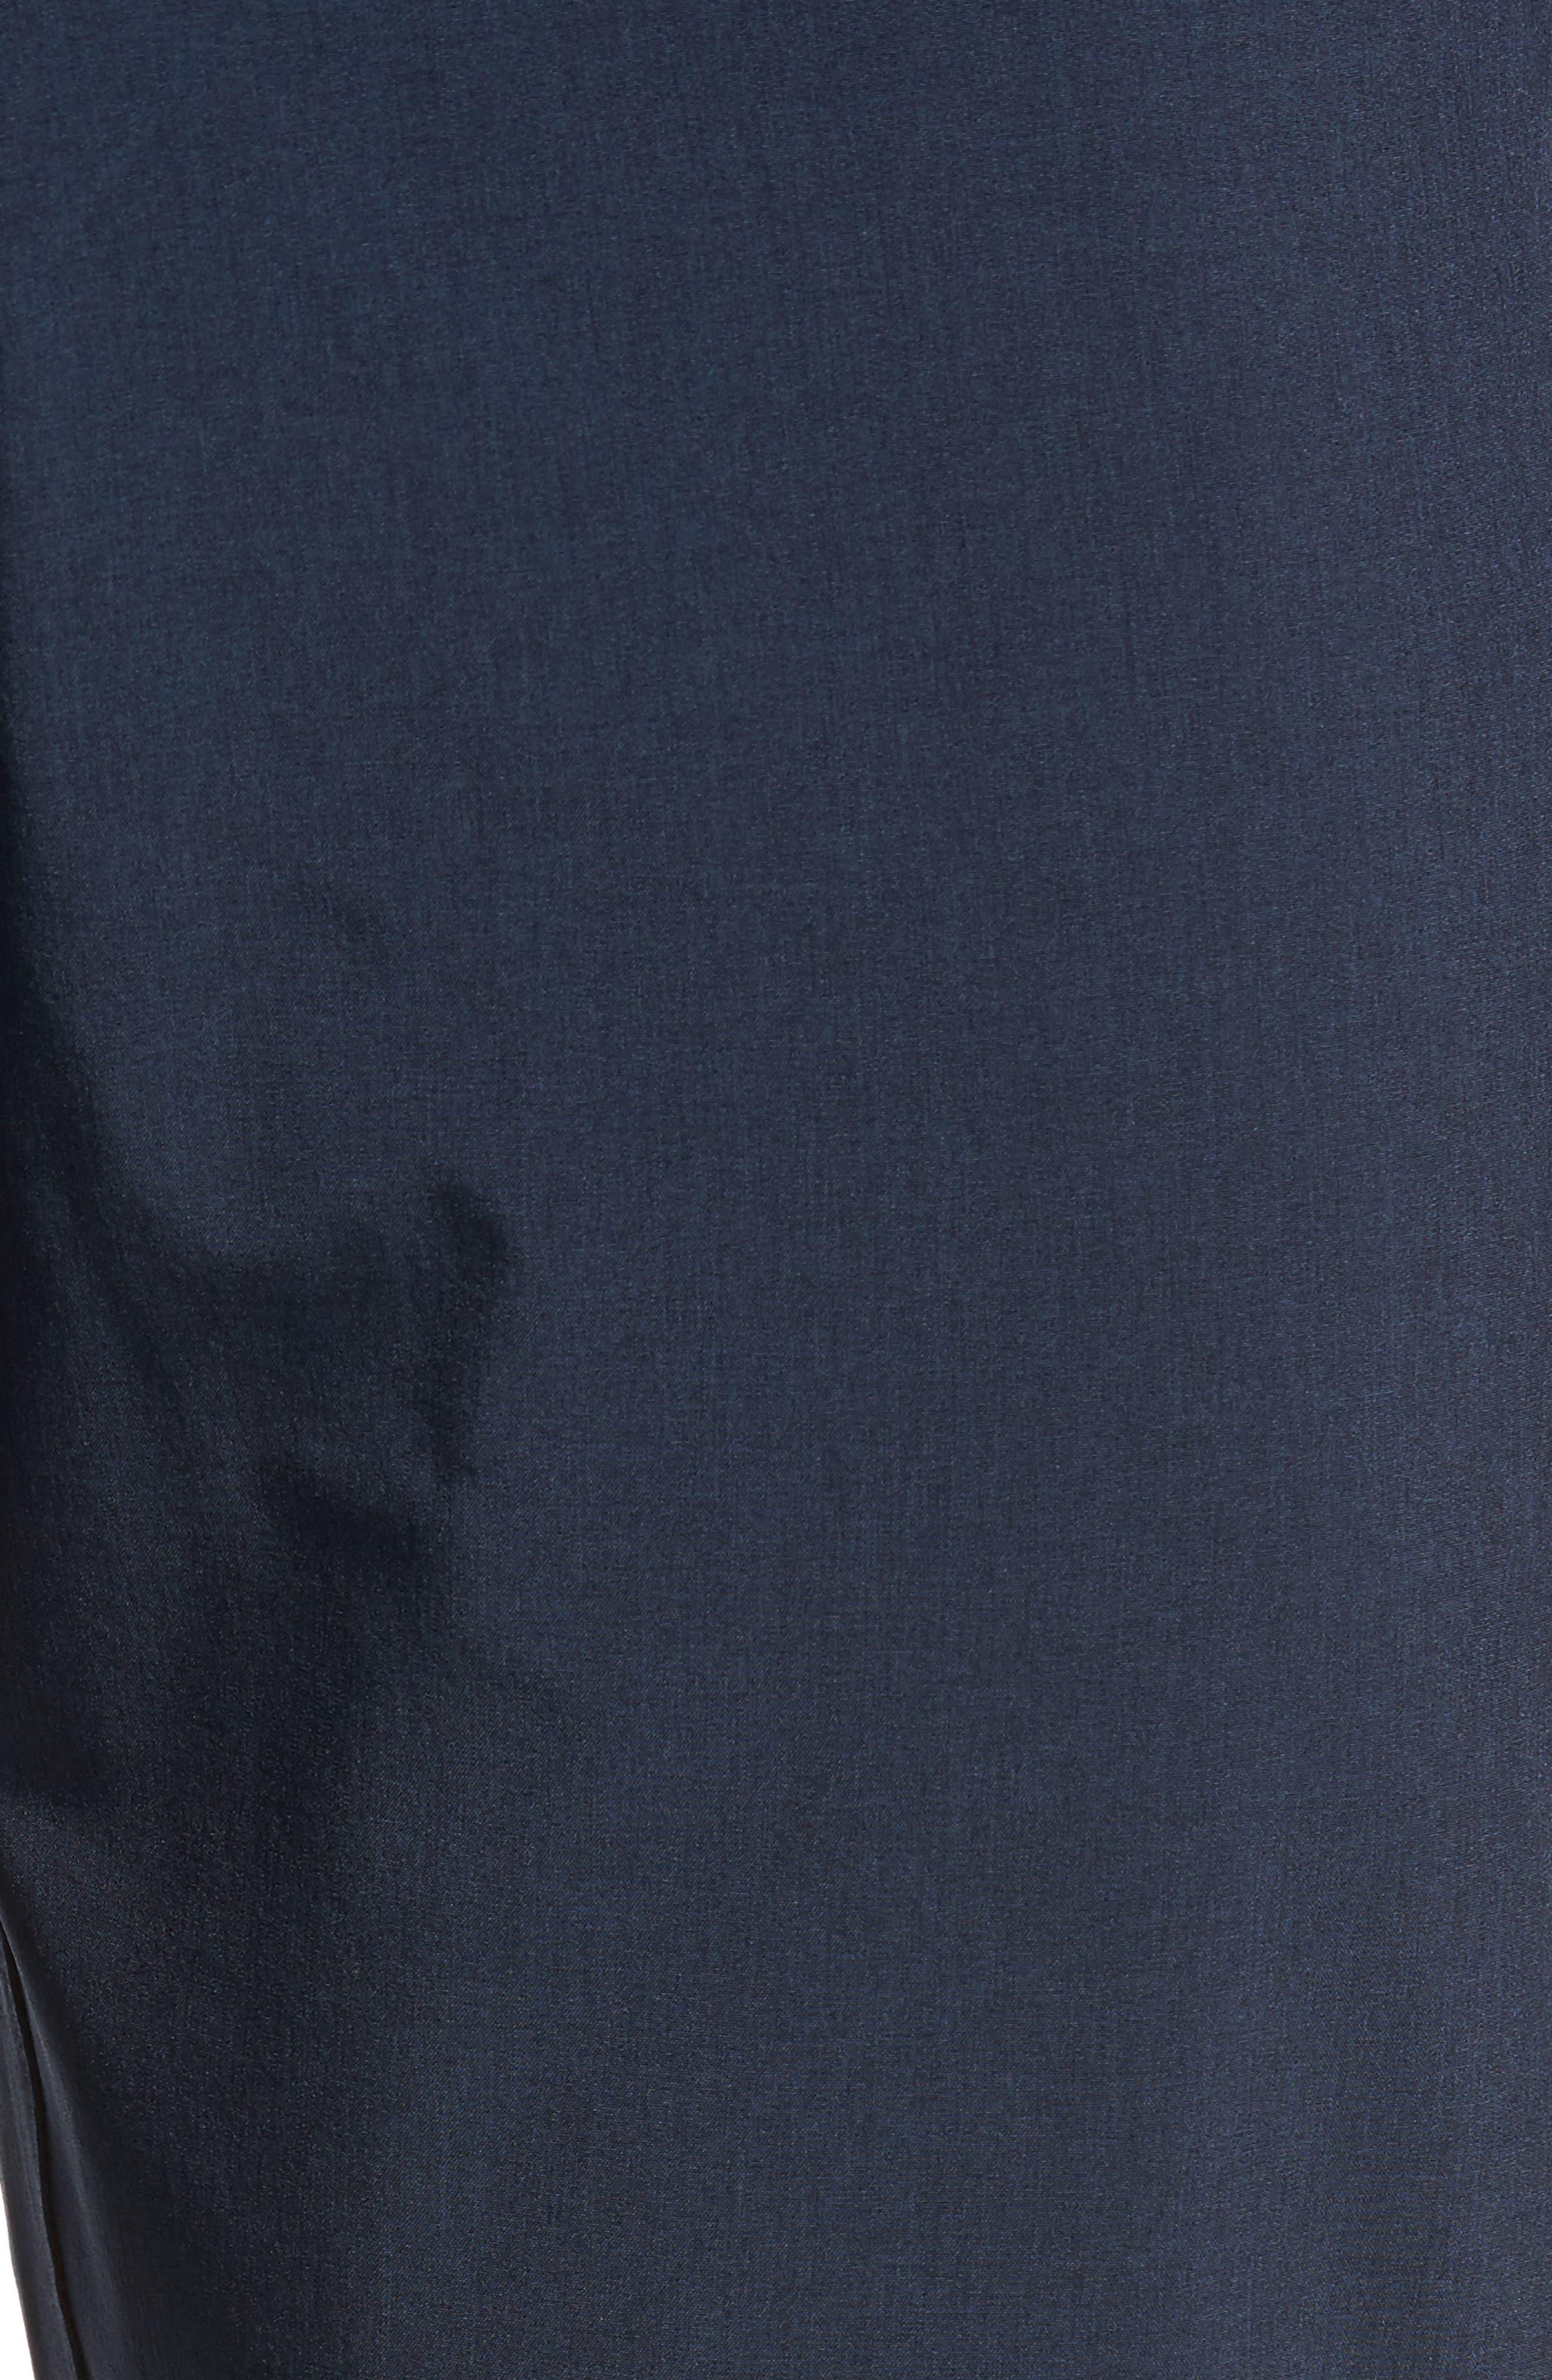 The Graduate Trousers,                             Alternate thumbnail 19, color,